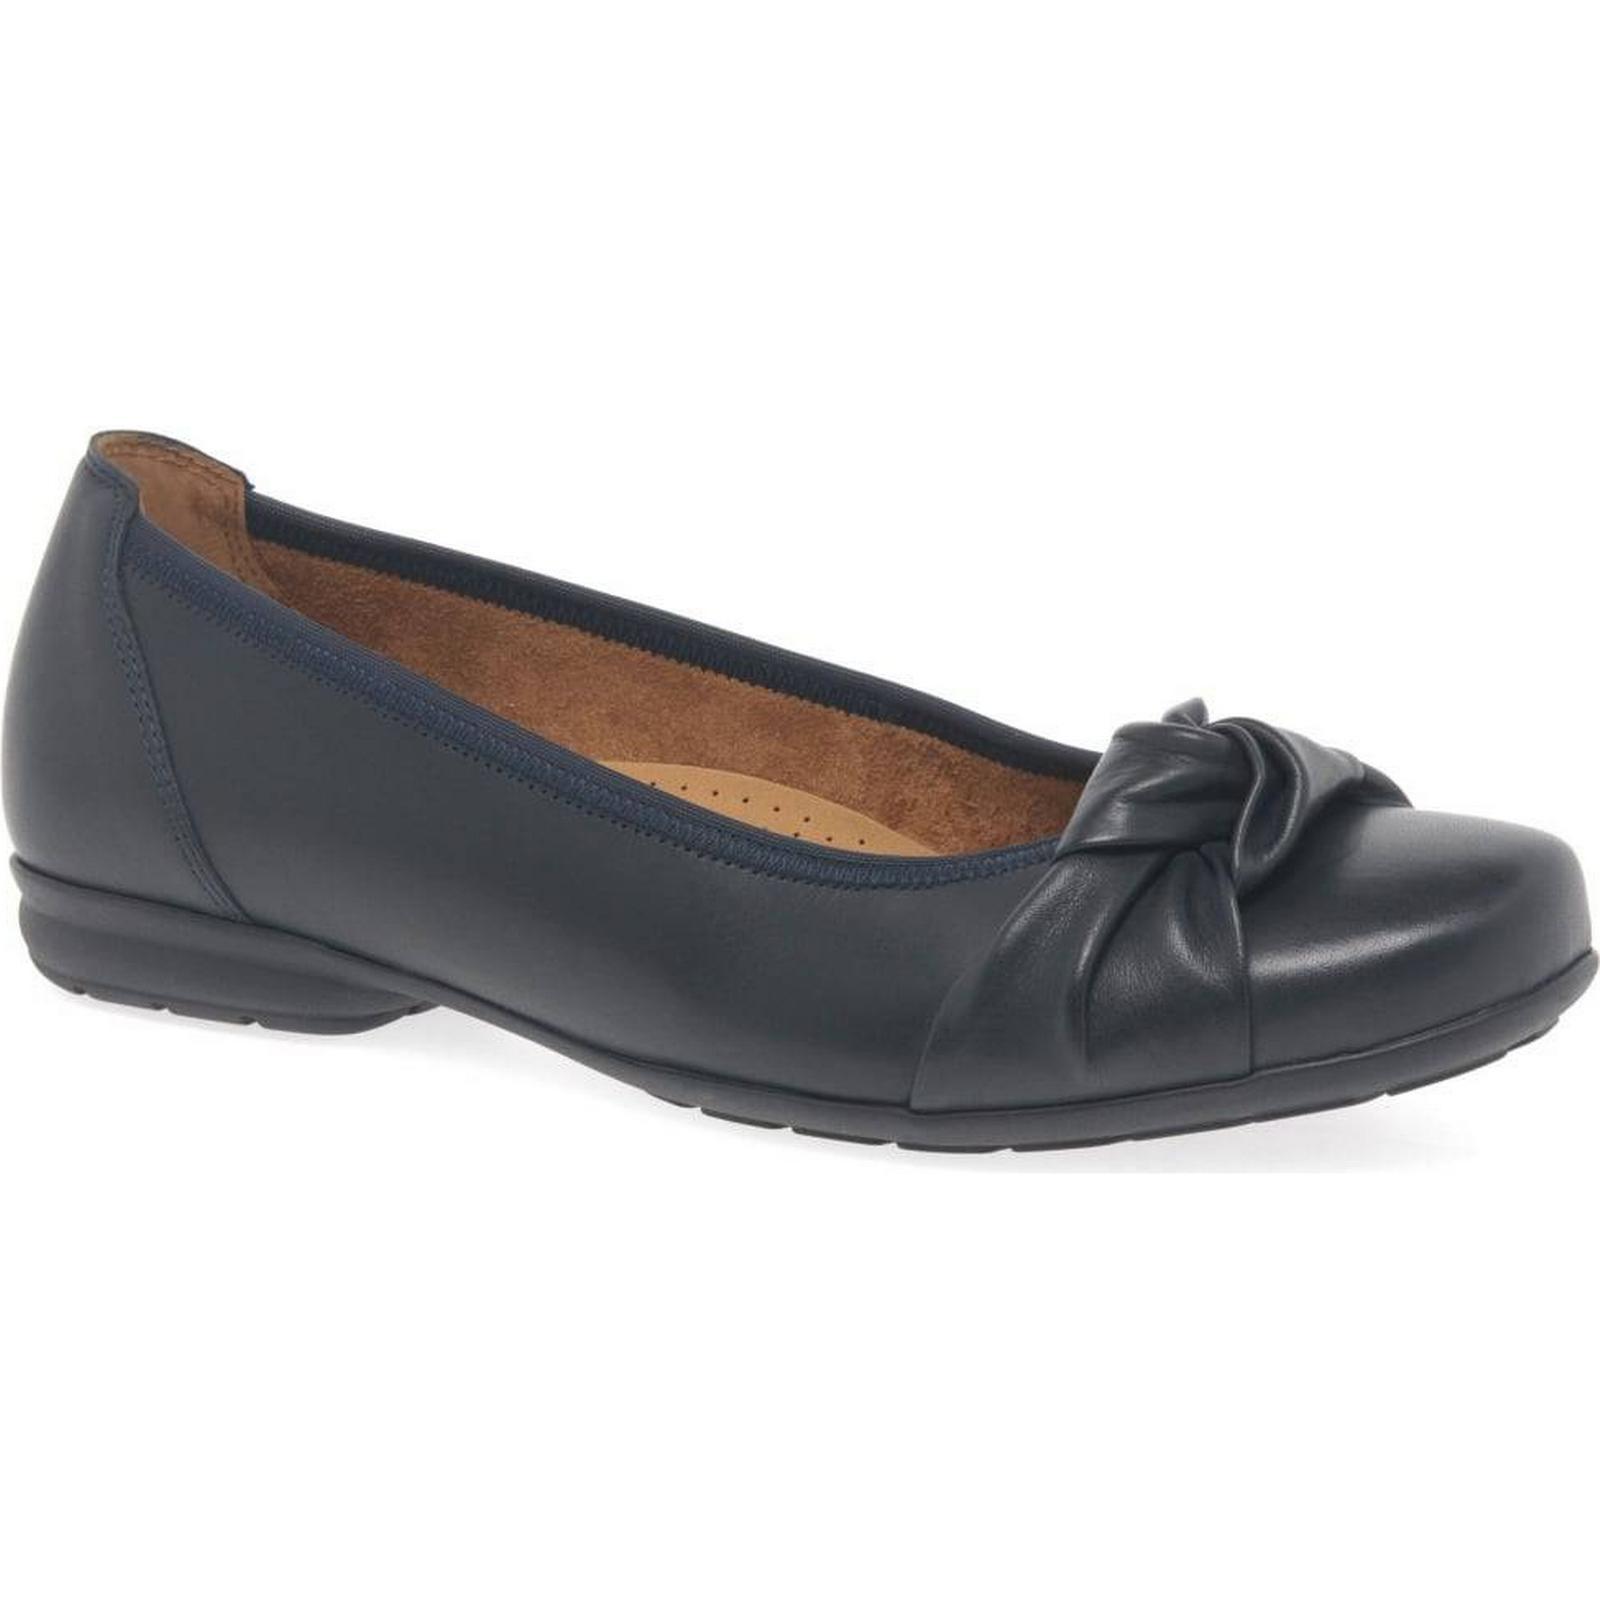 Gabor Ashlene Colour: Womens Casual Shoes Colour: Ashlene Navy, Size: 9 b06b9d